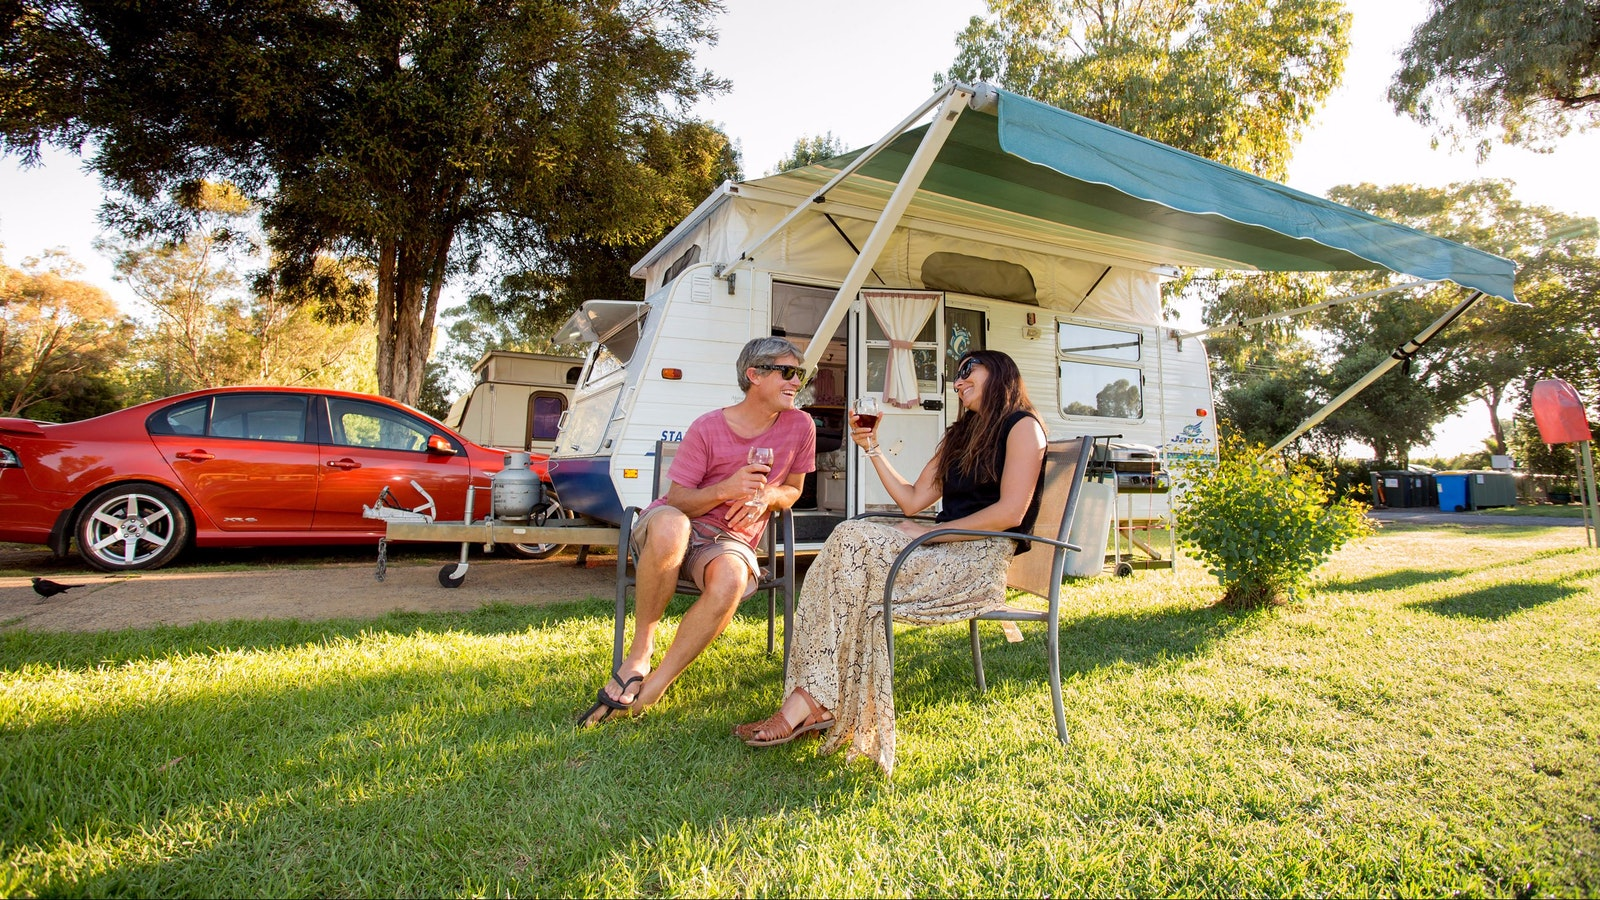 Secura Lifestyle Shepparton East caravan park